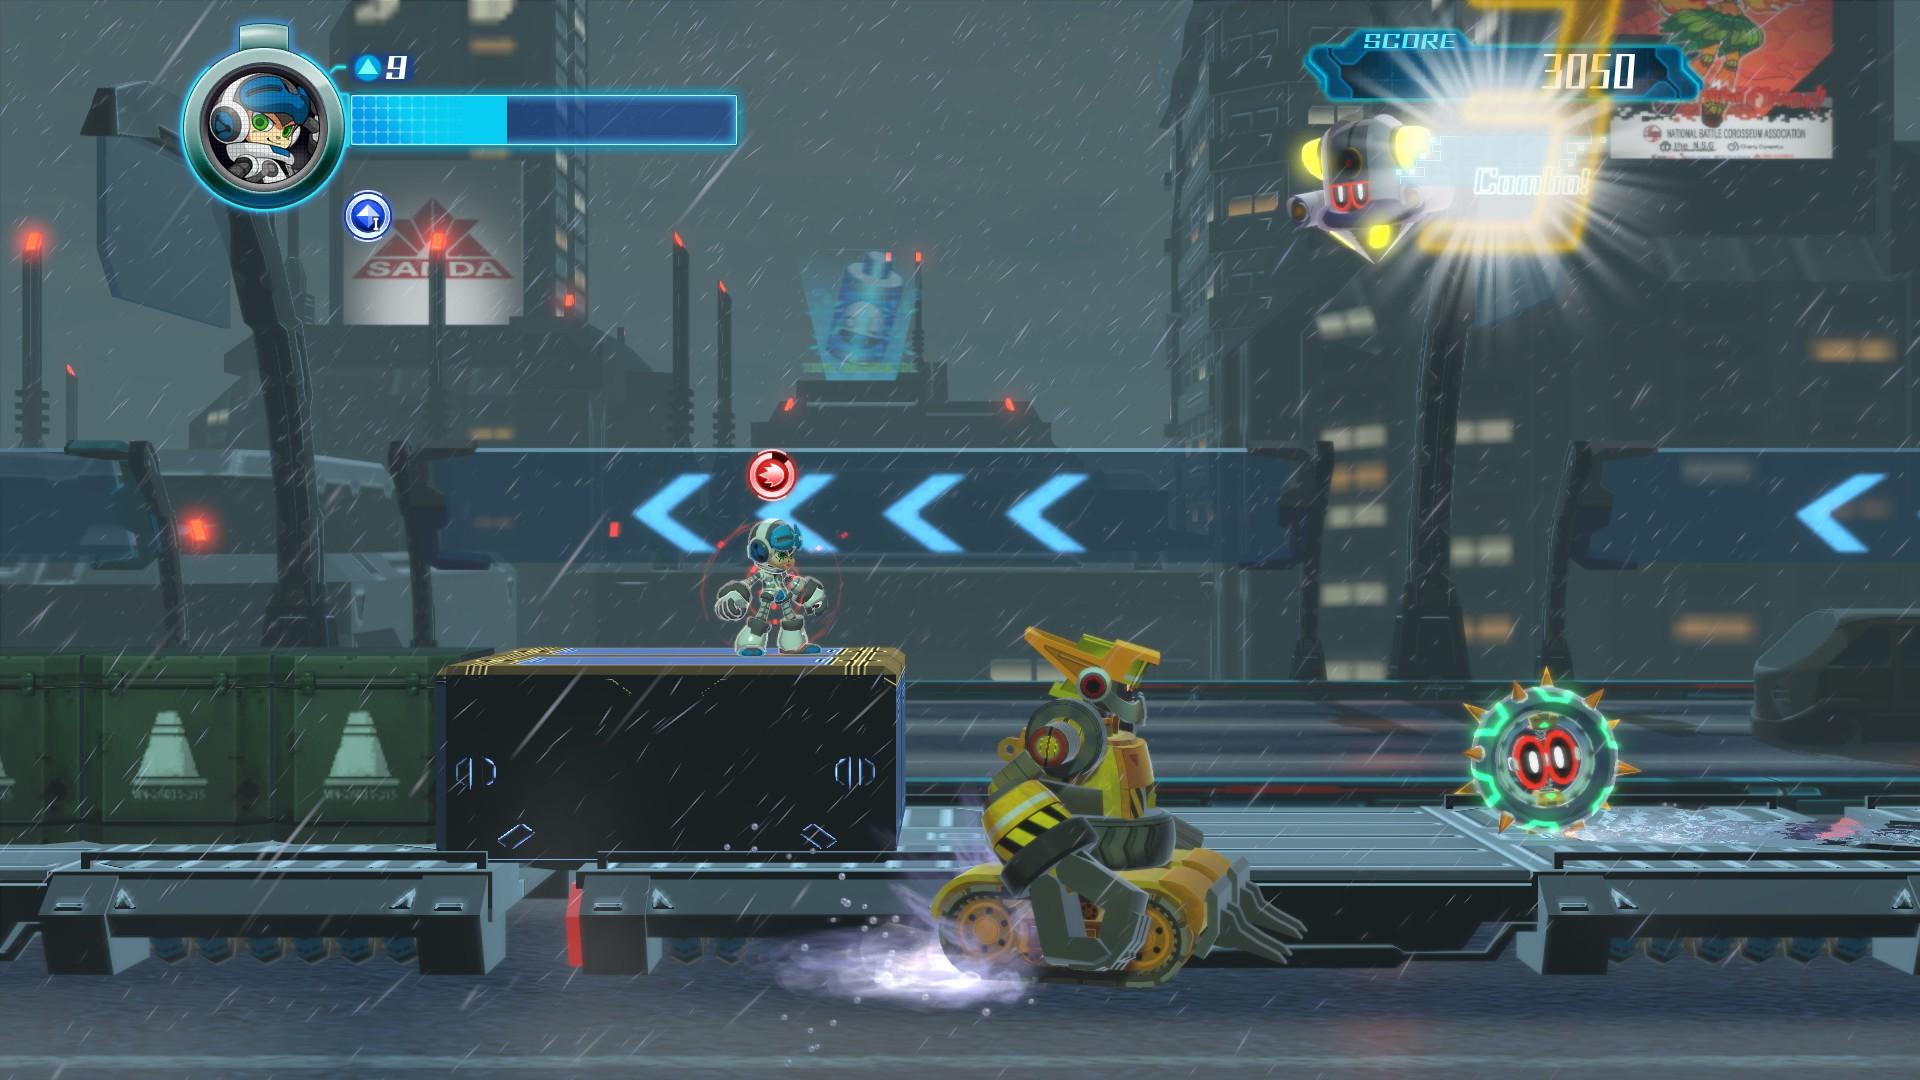 Mighty No. 9 Screenshot 3